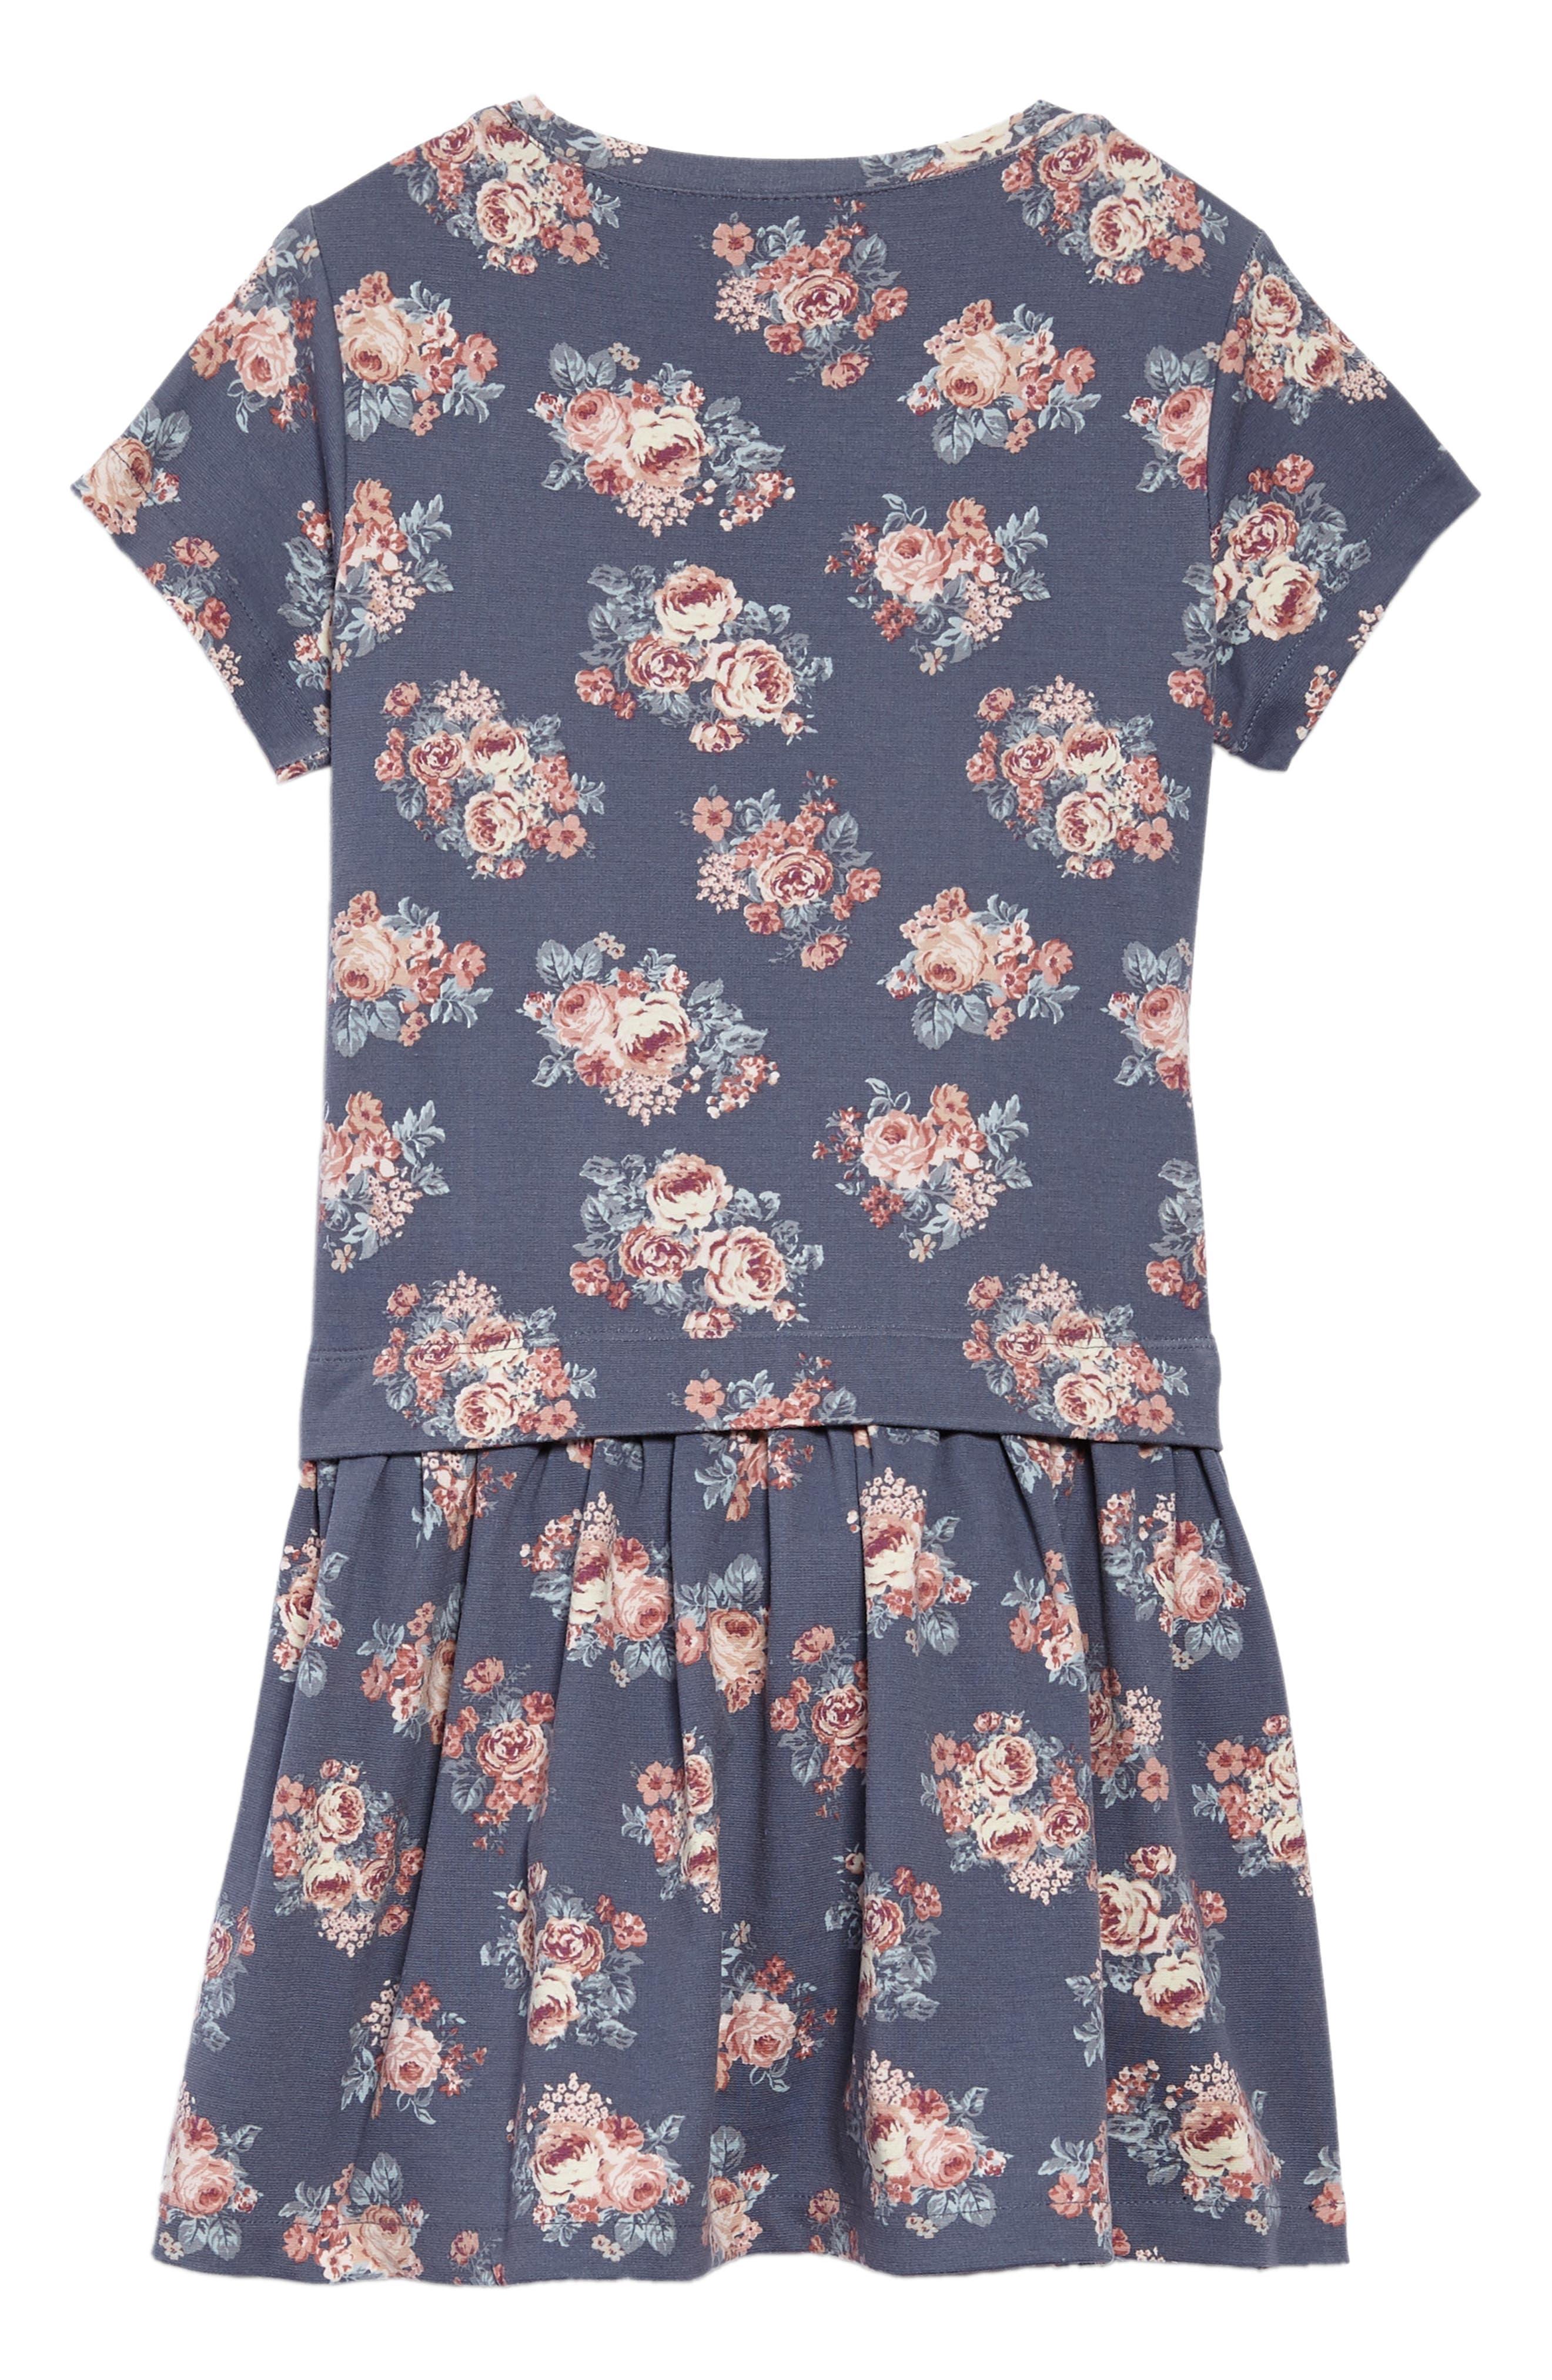 Michella Floral Print Dress,                             Alternate thumbnail 2, color,                             Grisaille